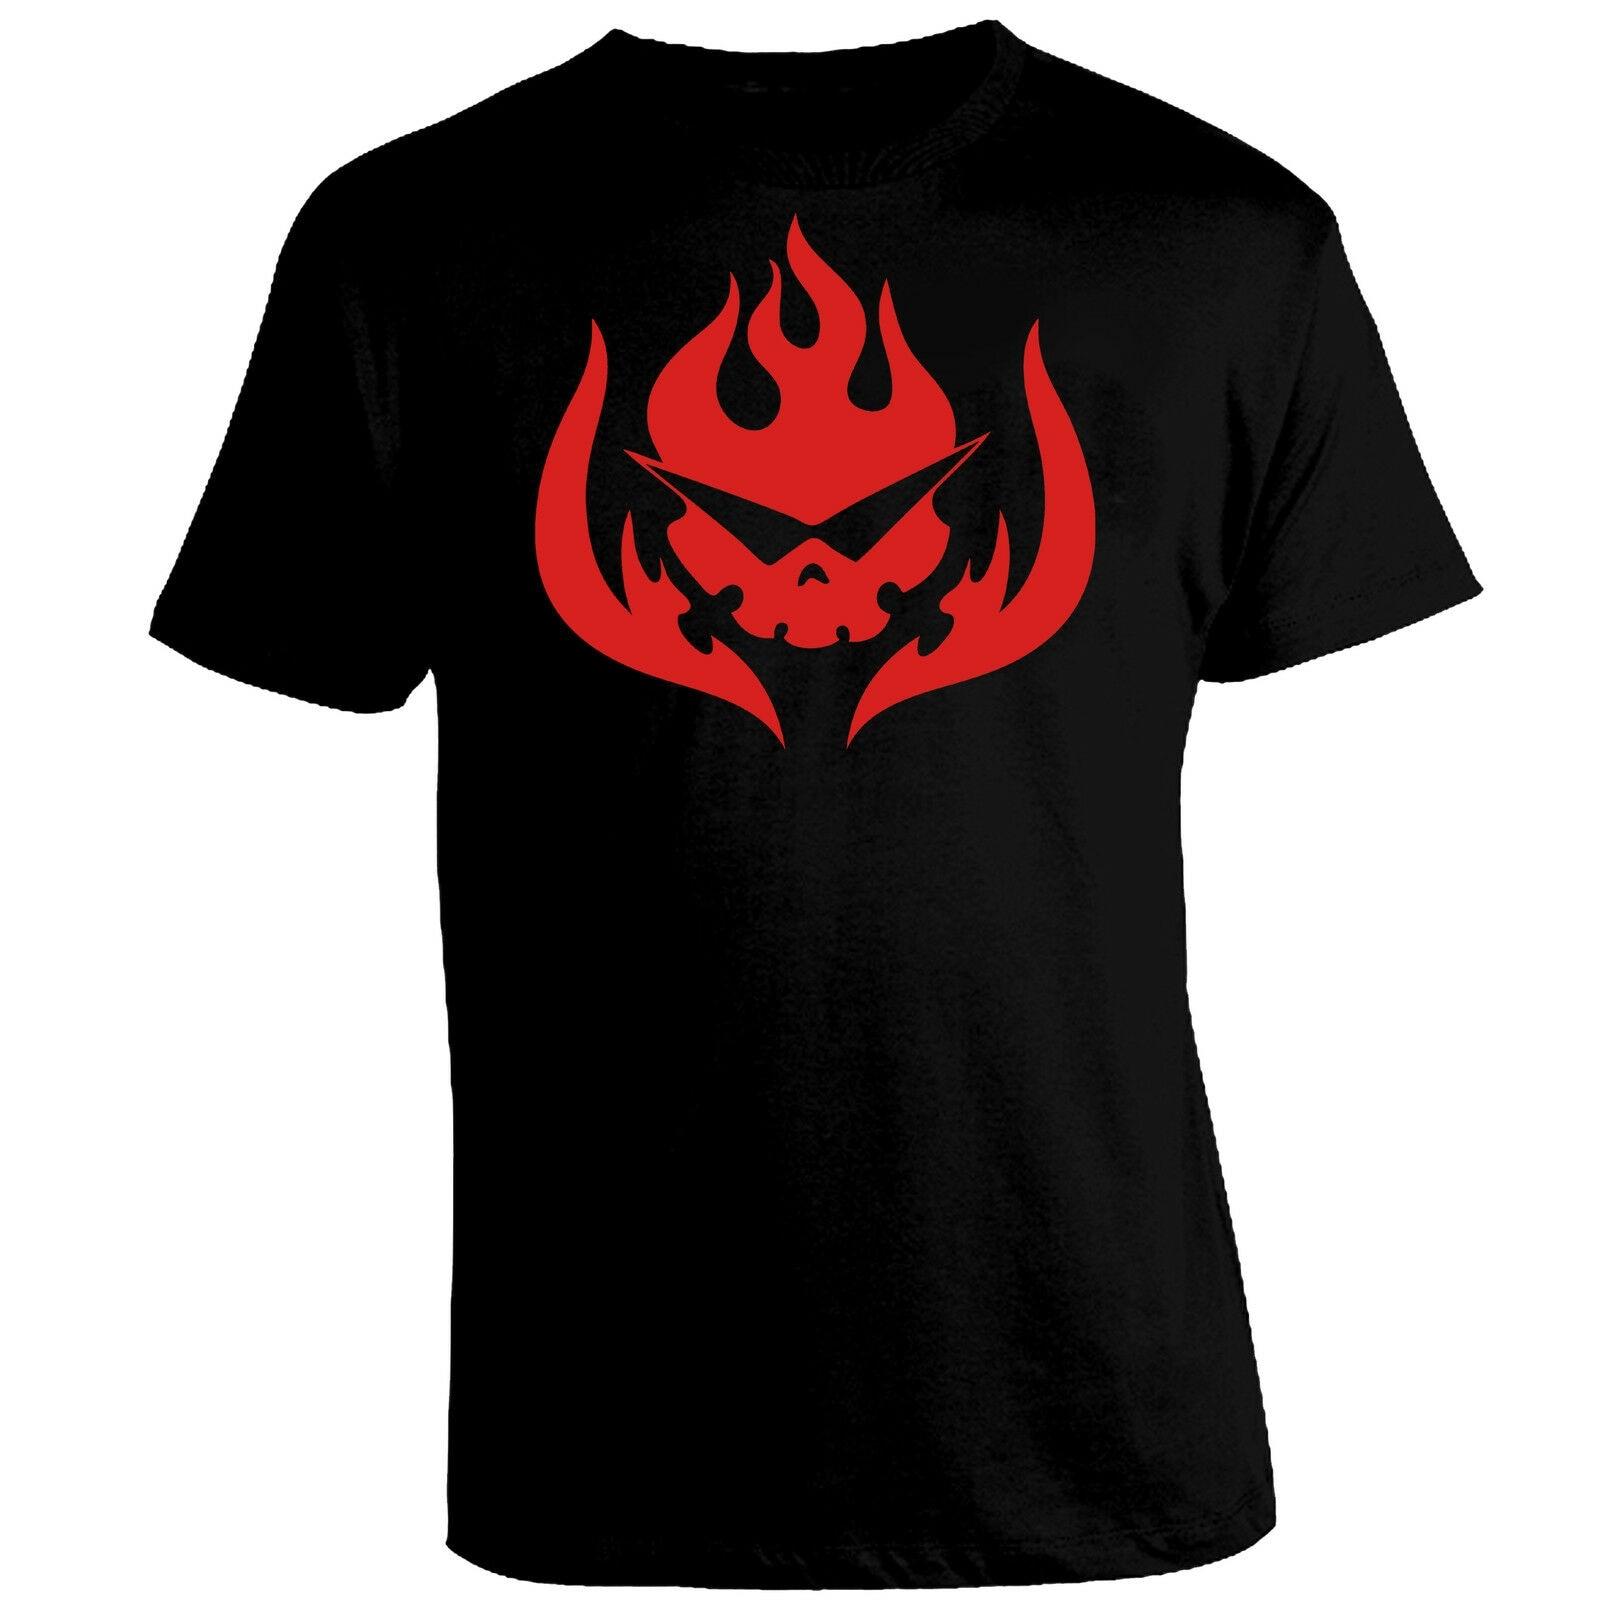 Tengen parche de logotipo Gurren Lagann Kamina Yoko camiseta anime negro camiseta T-Shirt-Mostrar título original